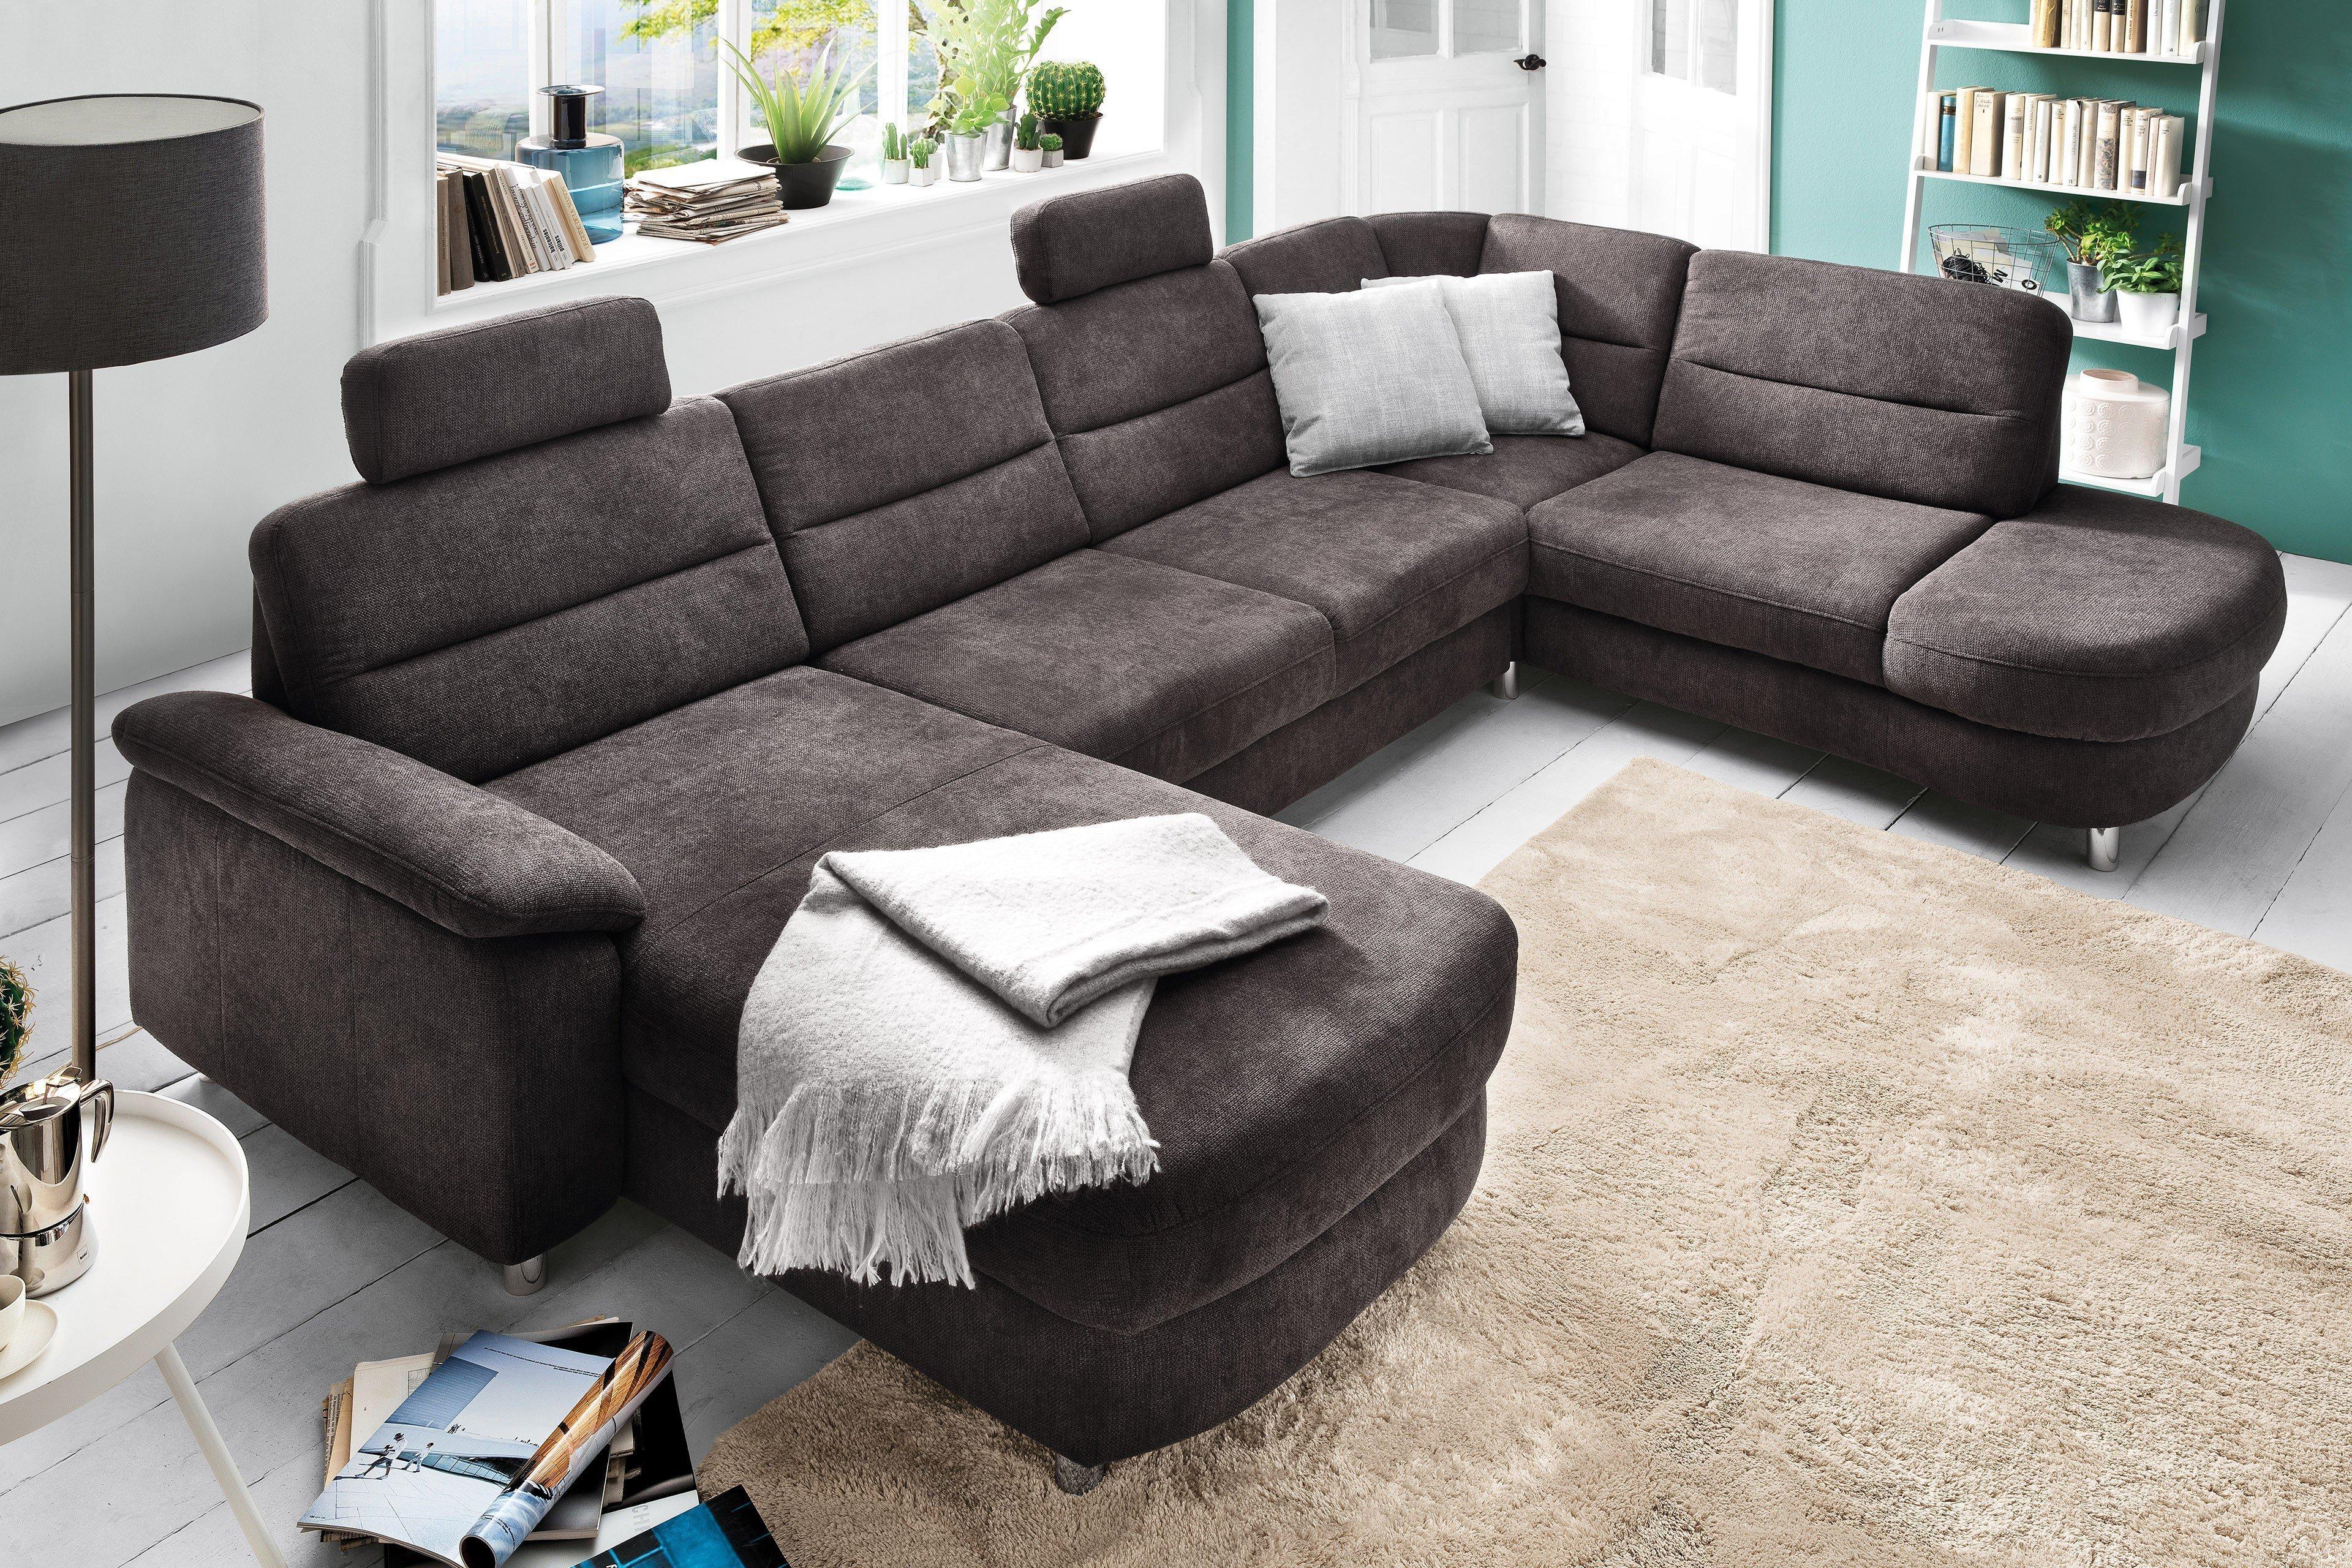 sit more delano wohnlandschaft grau m bel letz ihr online shop. Black Bedroom Furniture Sets. Home Design Ideas